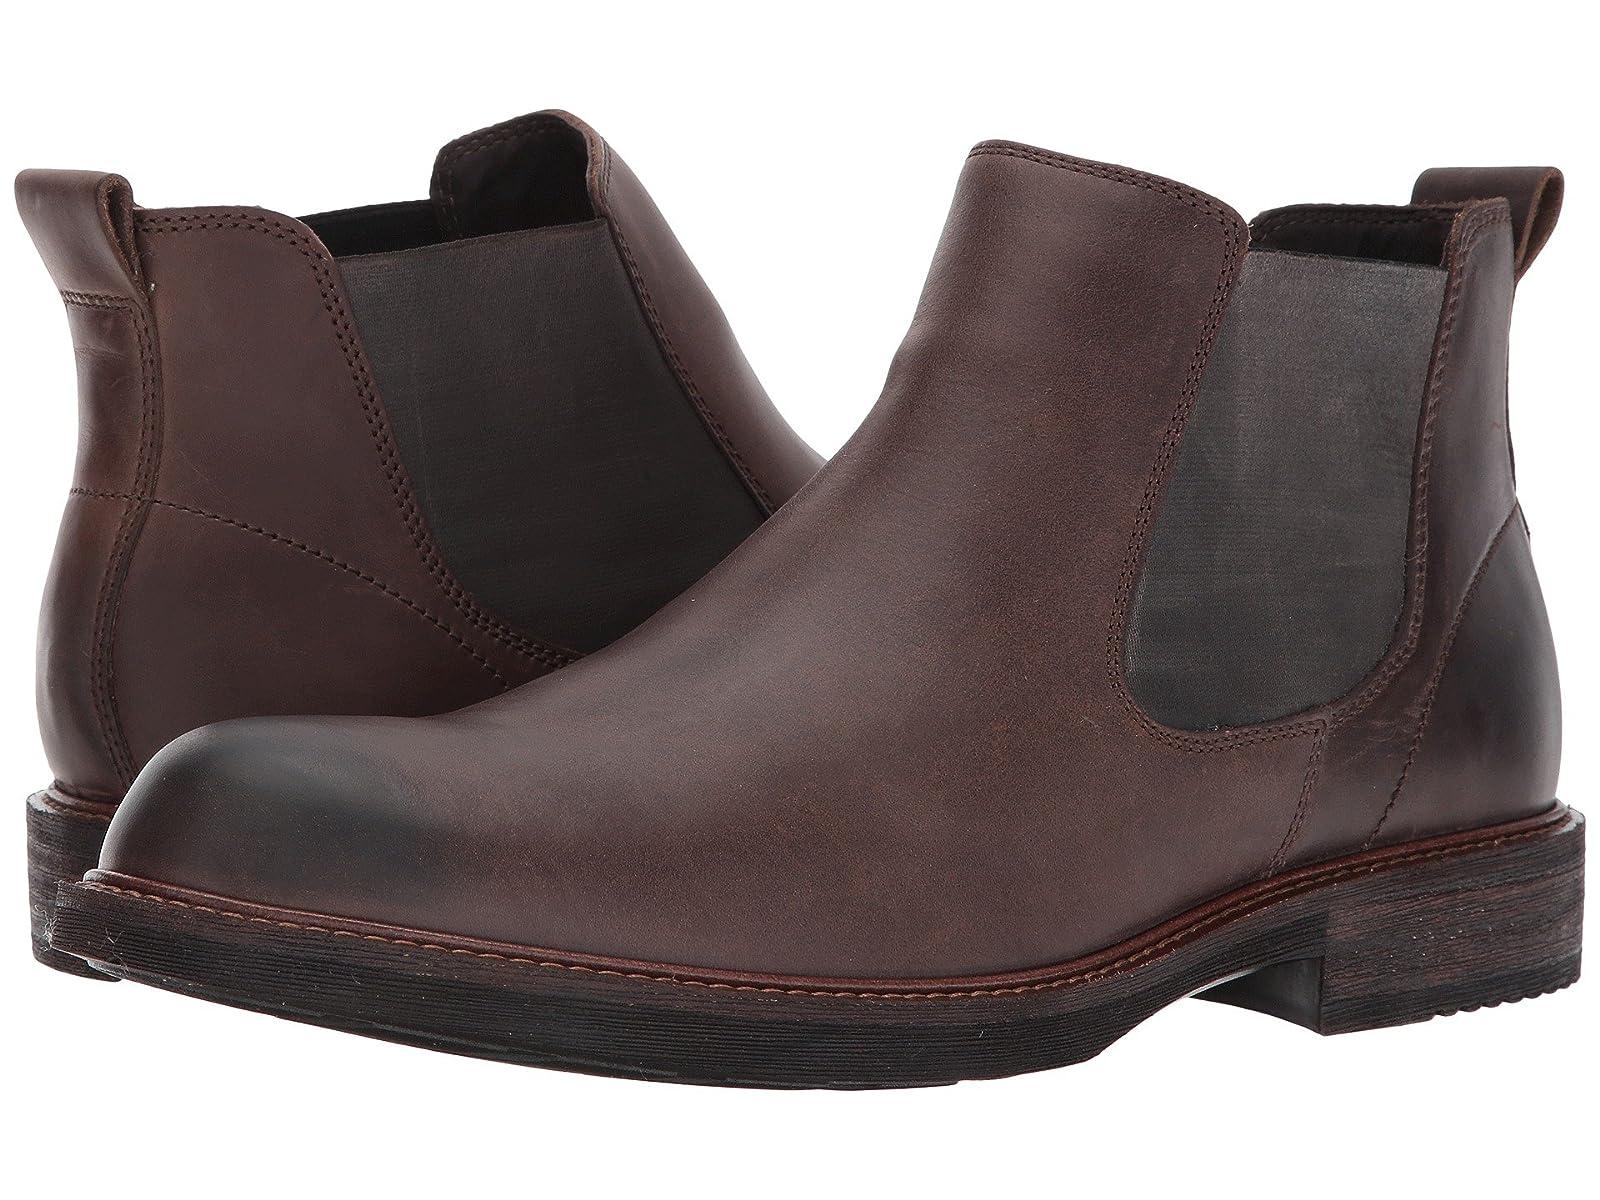 ECCO Kenton Chelsea BootCheap and distinctive eye-catching shoes